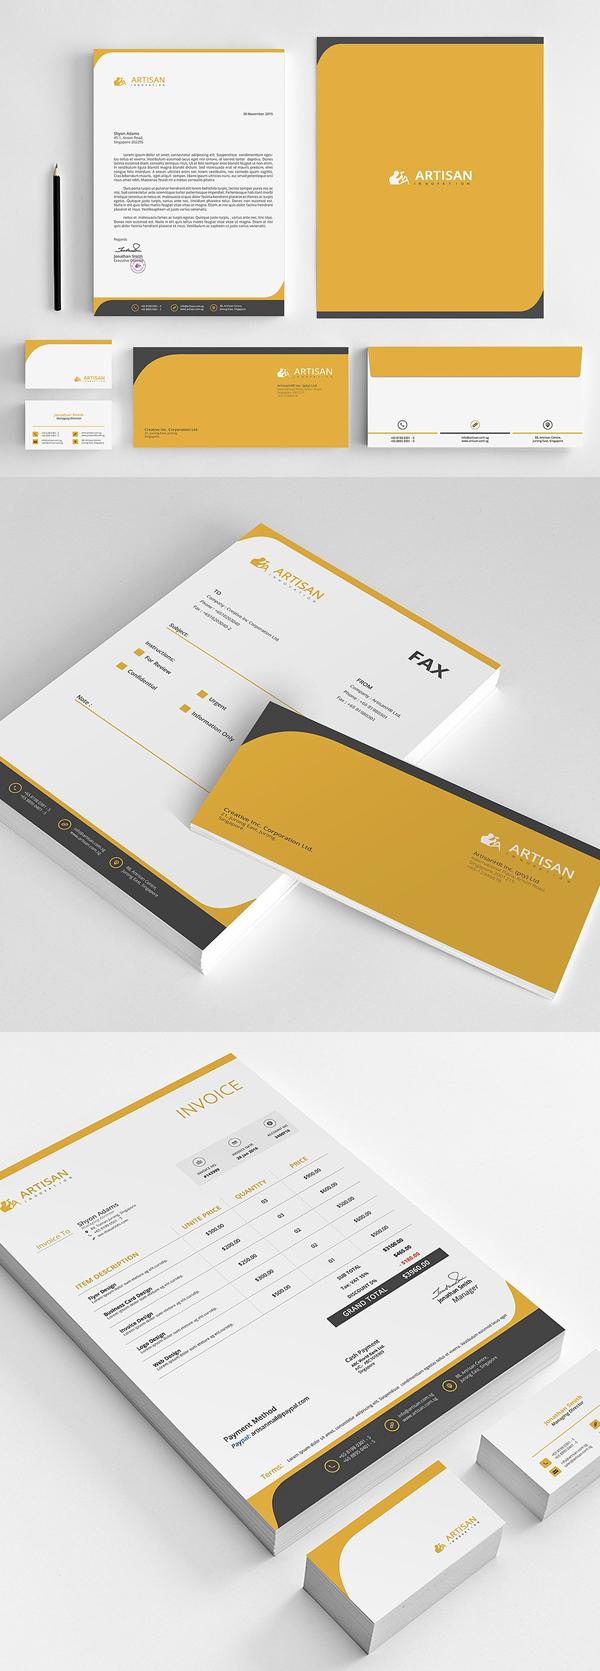 50 Professional Corporate Branding / Stationery Templates Design - 15